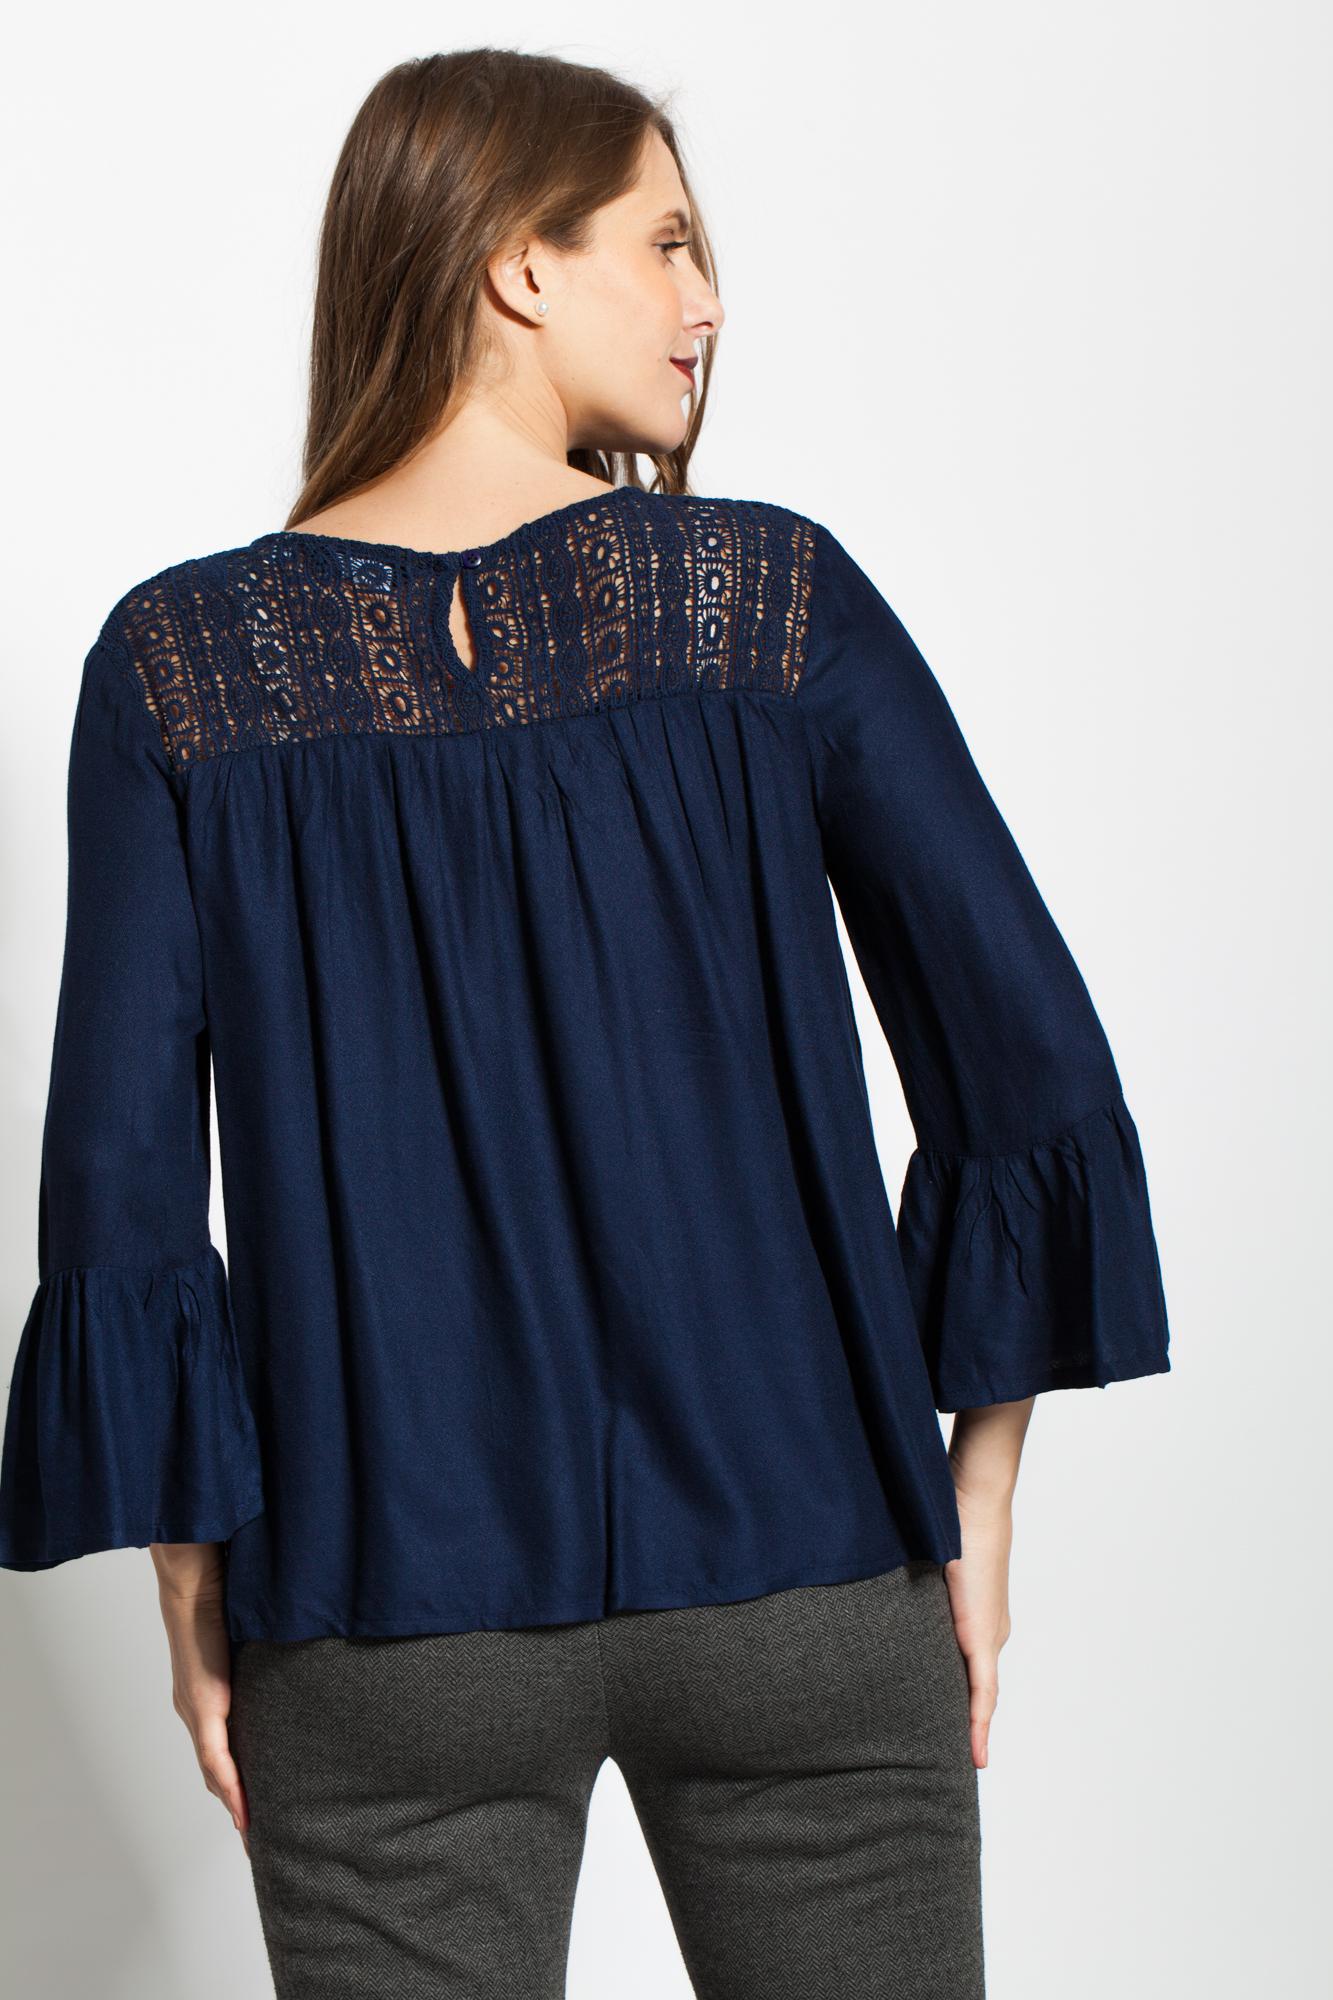 Bluza bleumarin broderie sparta si maneci cu volane